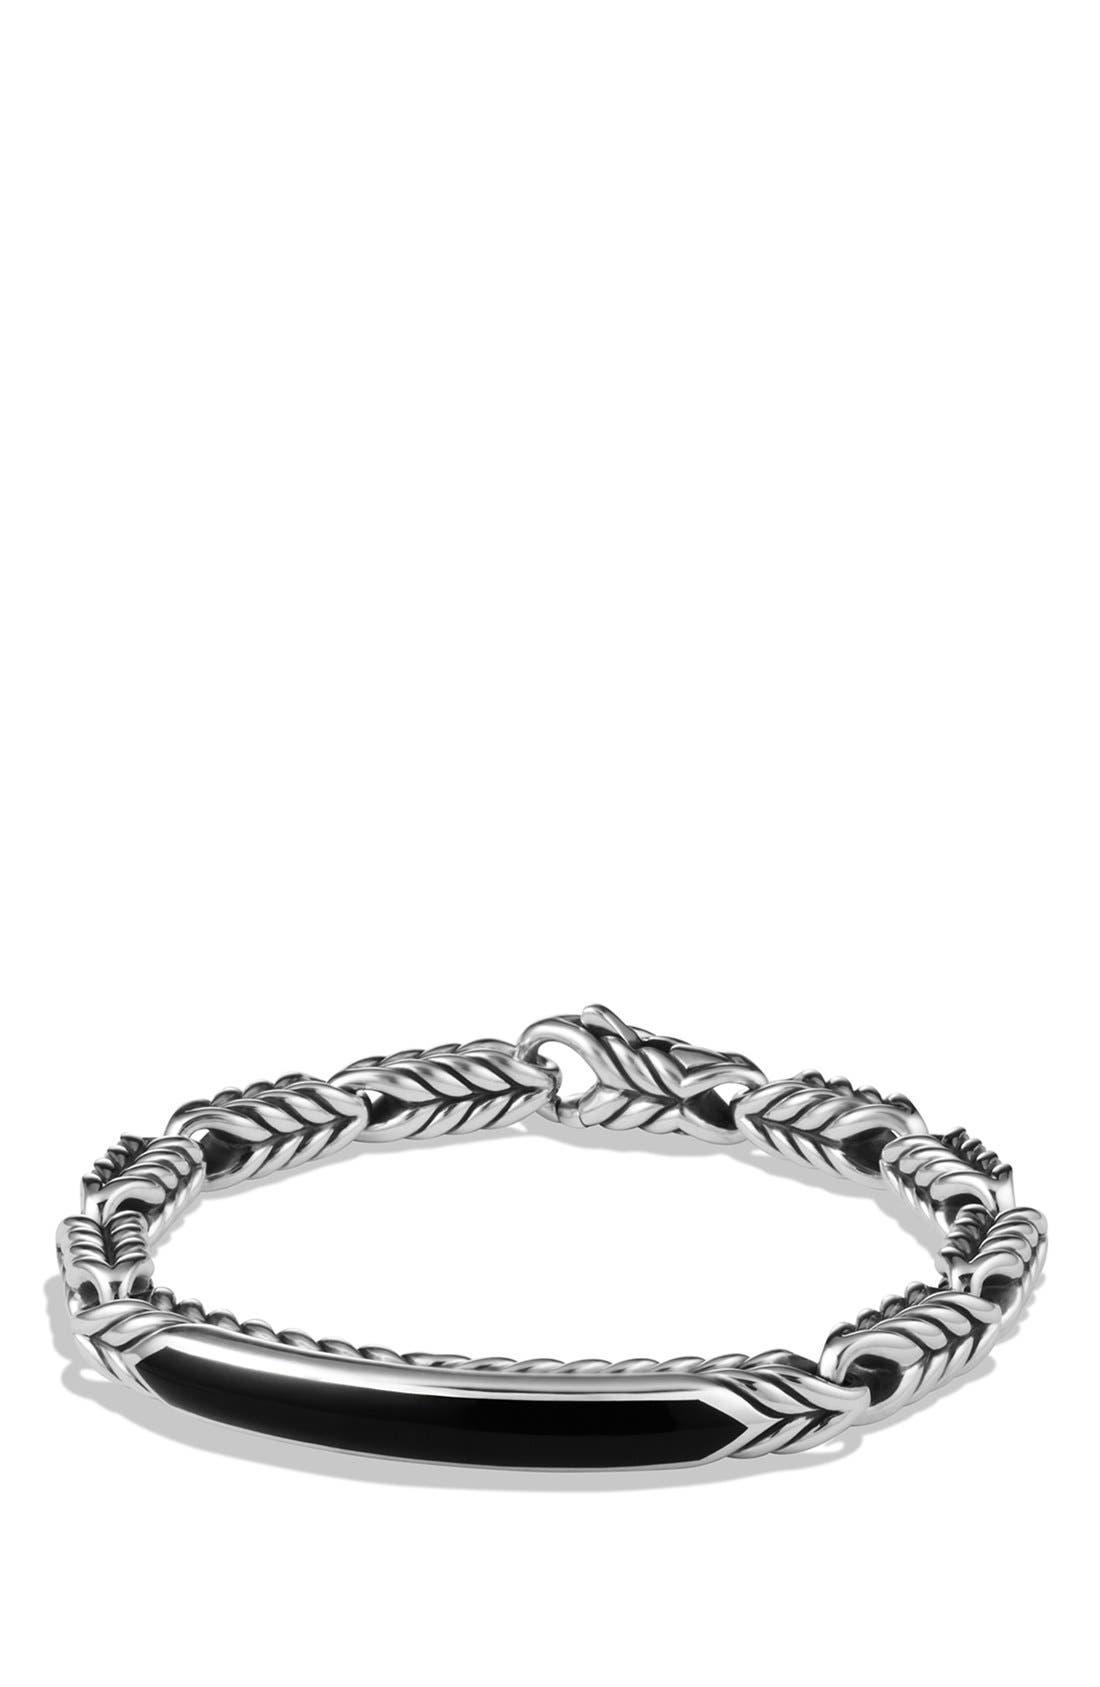 Main Image - David Yurman 'Chevron' ID Bracelet